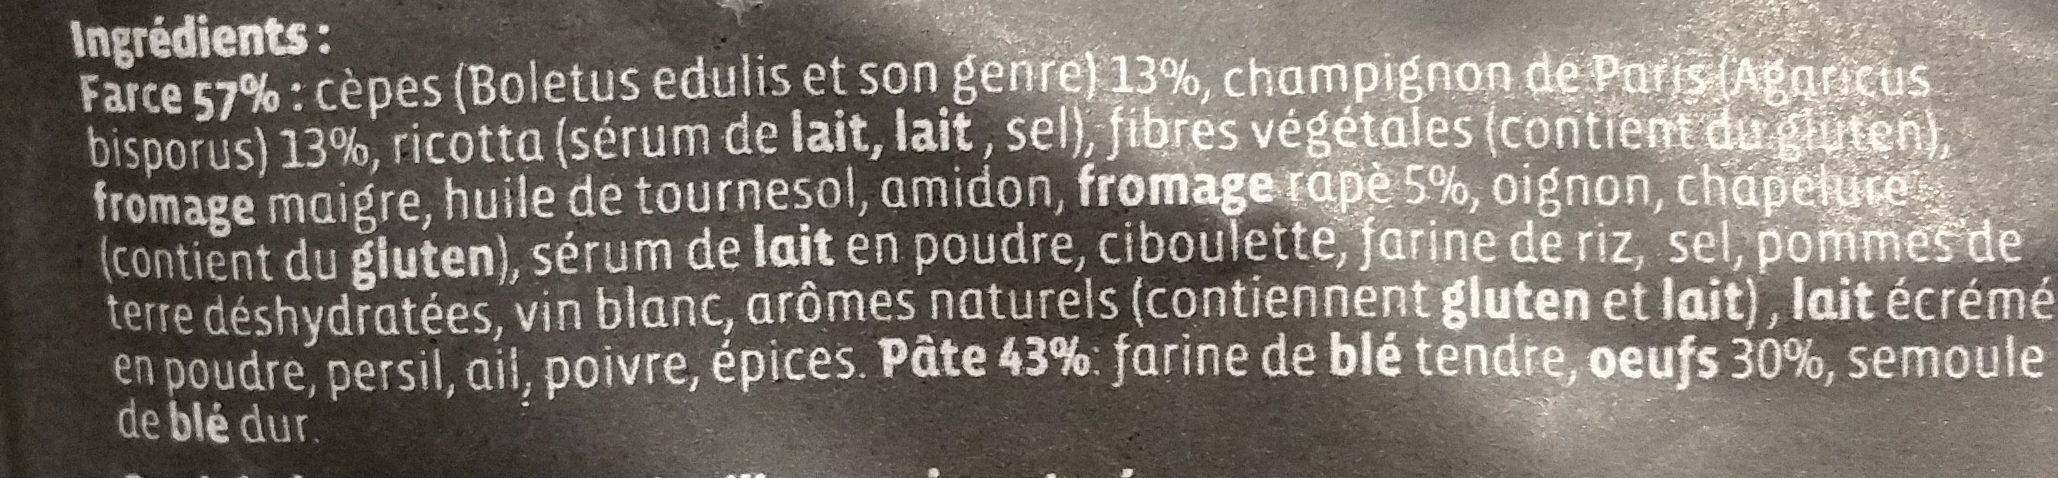 Grand ravioli cèpes - Ingrédients - fr